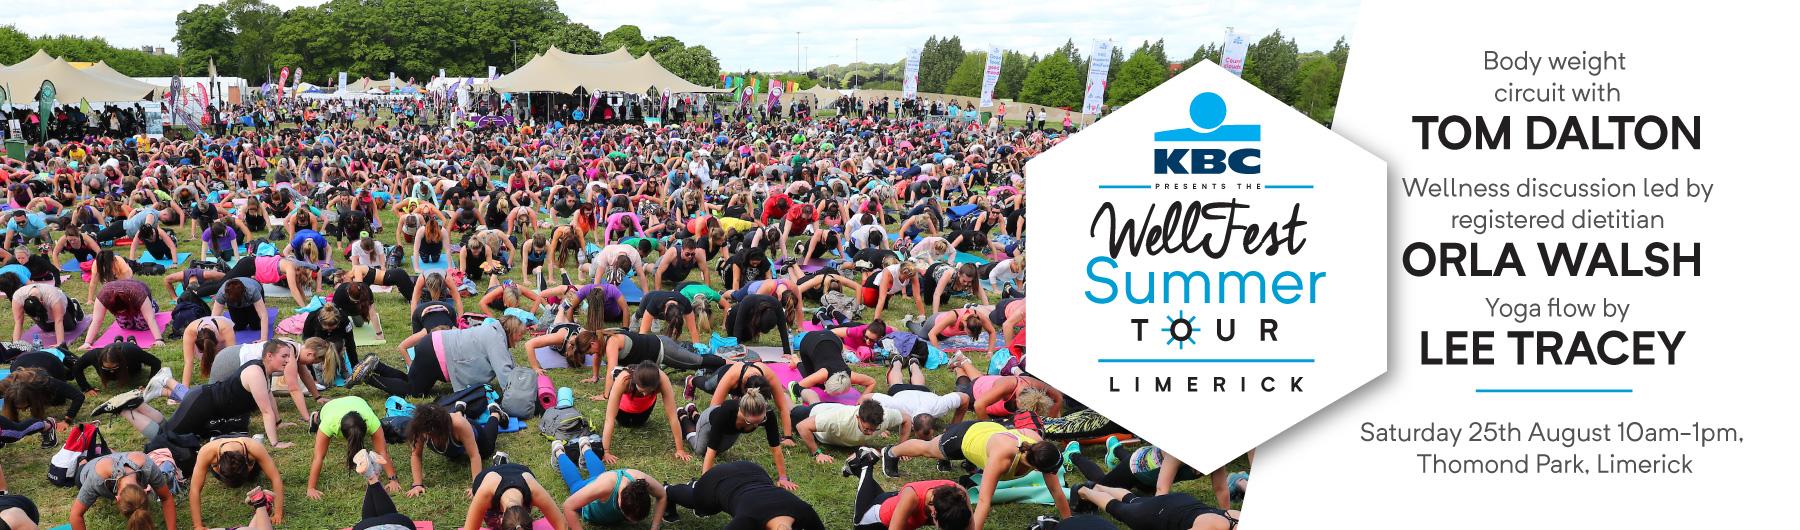 Limerick - KBC presents the WellFest Summer Tour